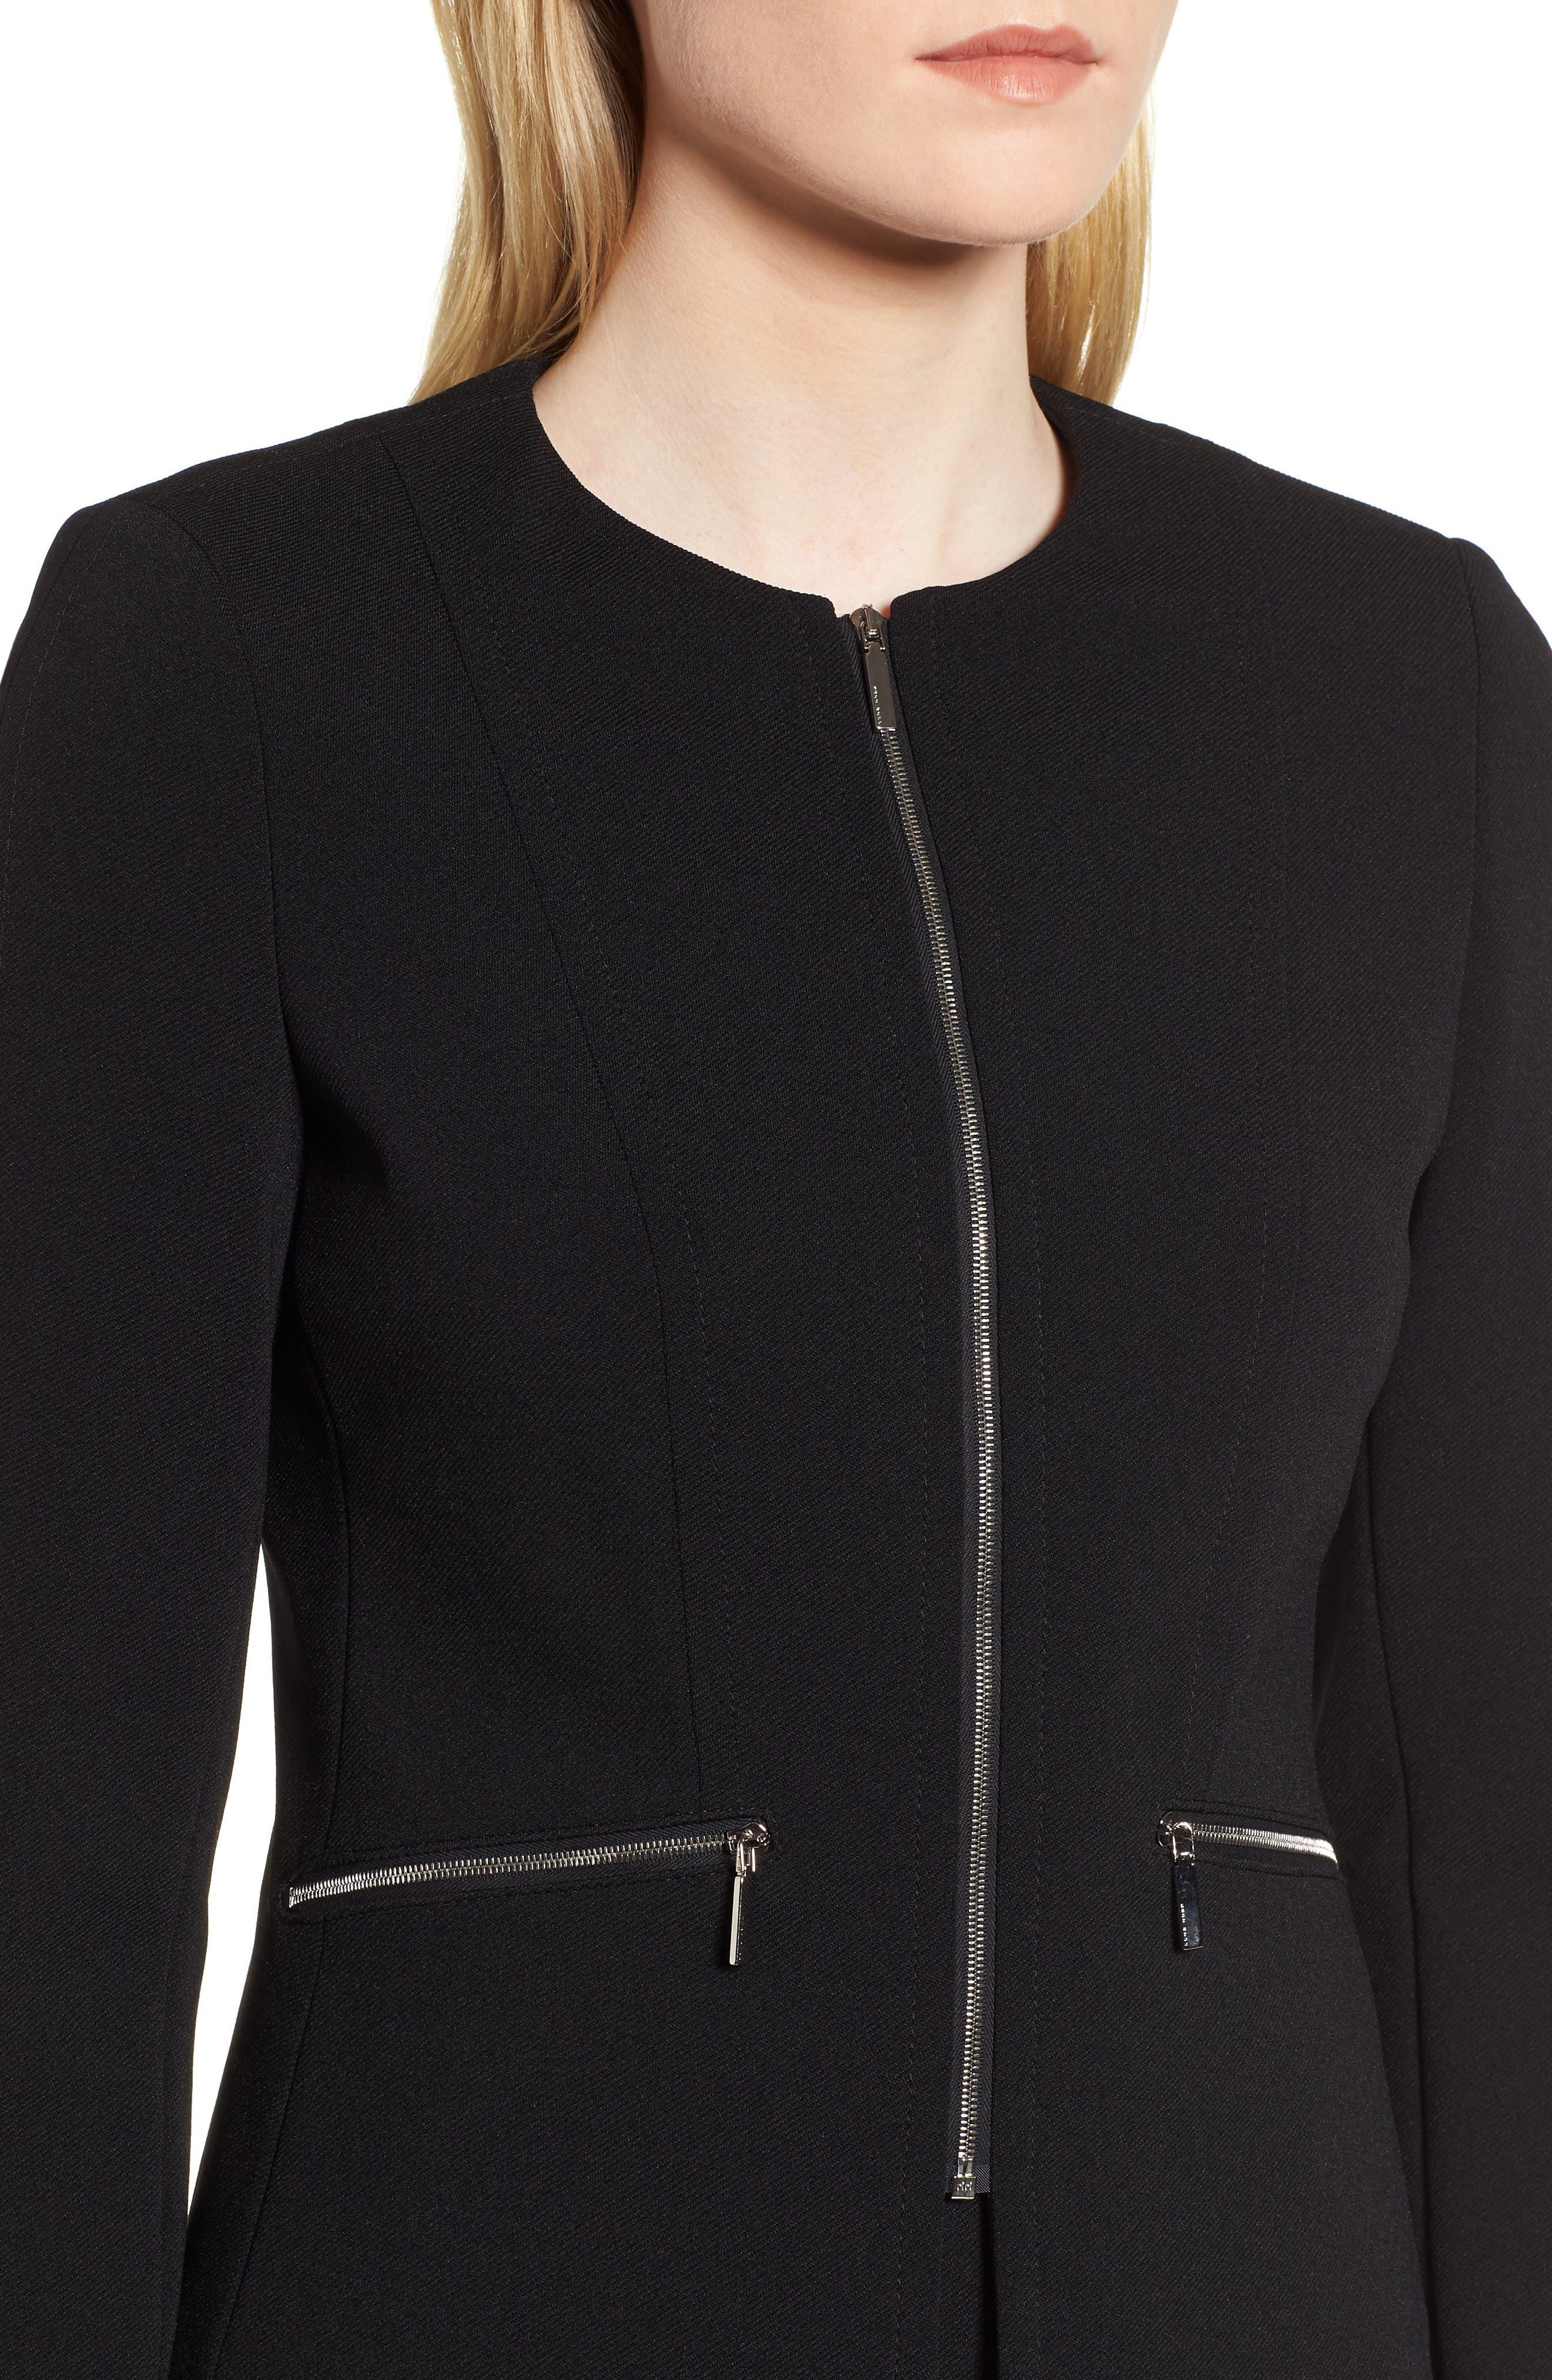 Jazulara Twill Jersey Suit Jacket,                             Alternate thumbnail 4, color,                             001